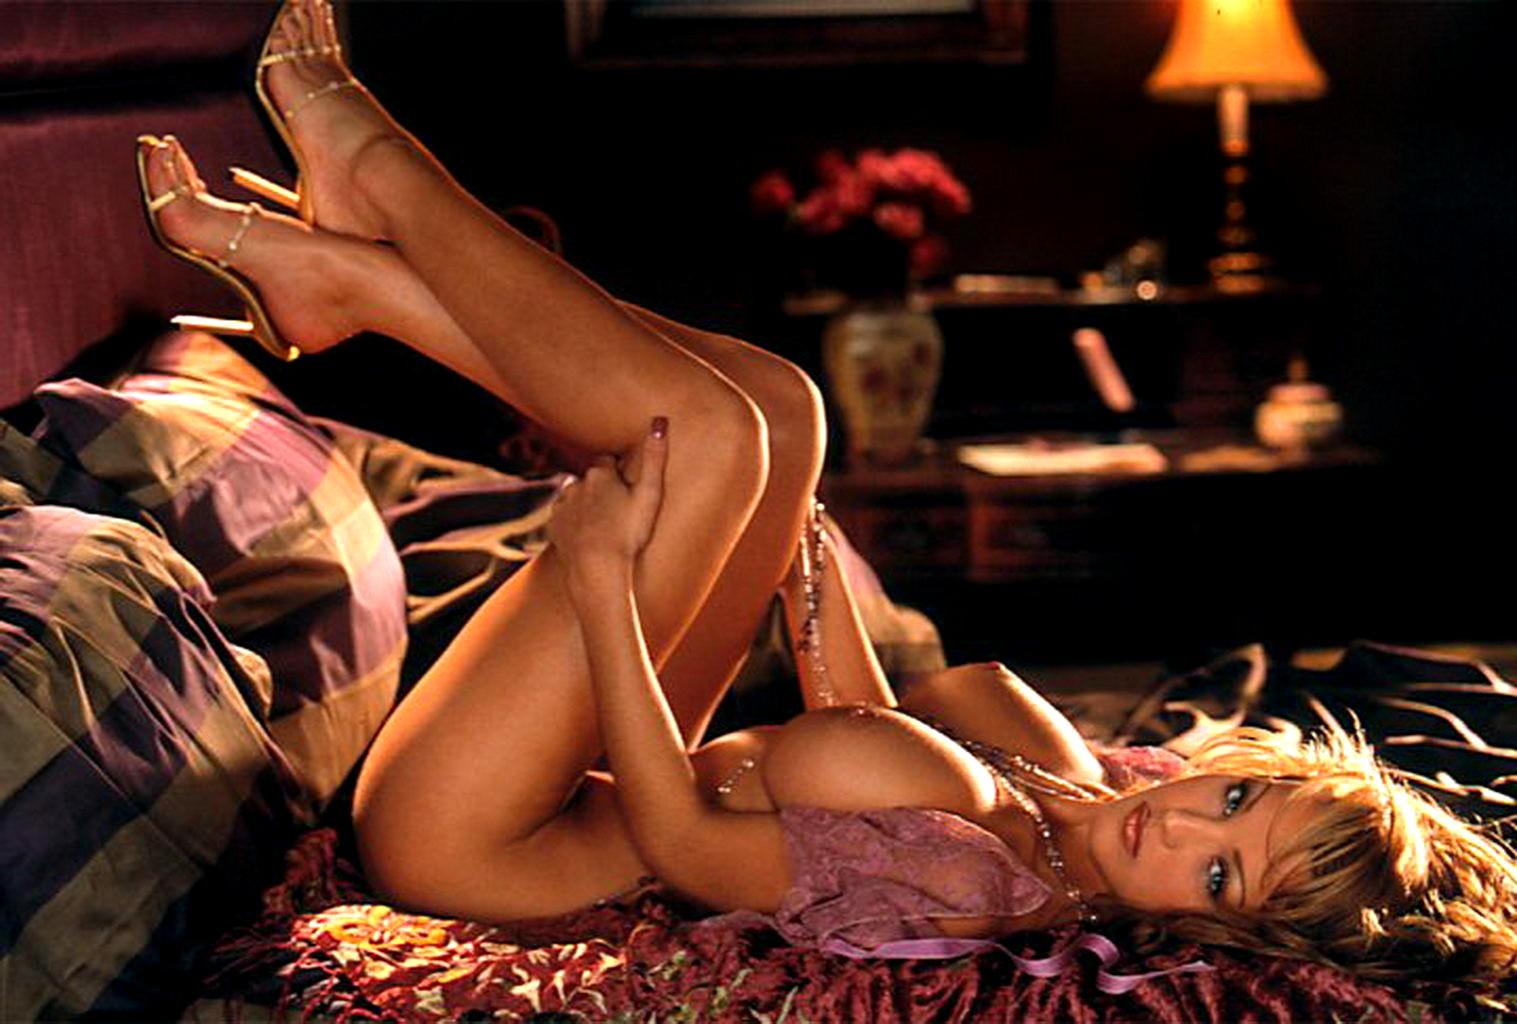 Heather nichols nude